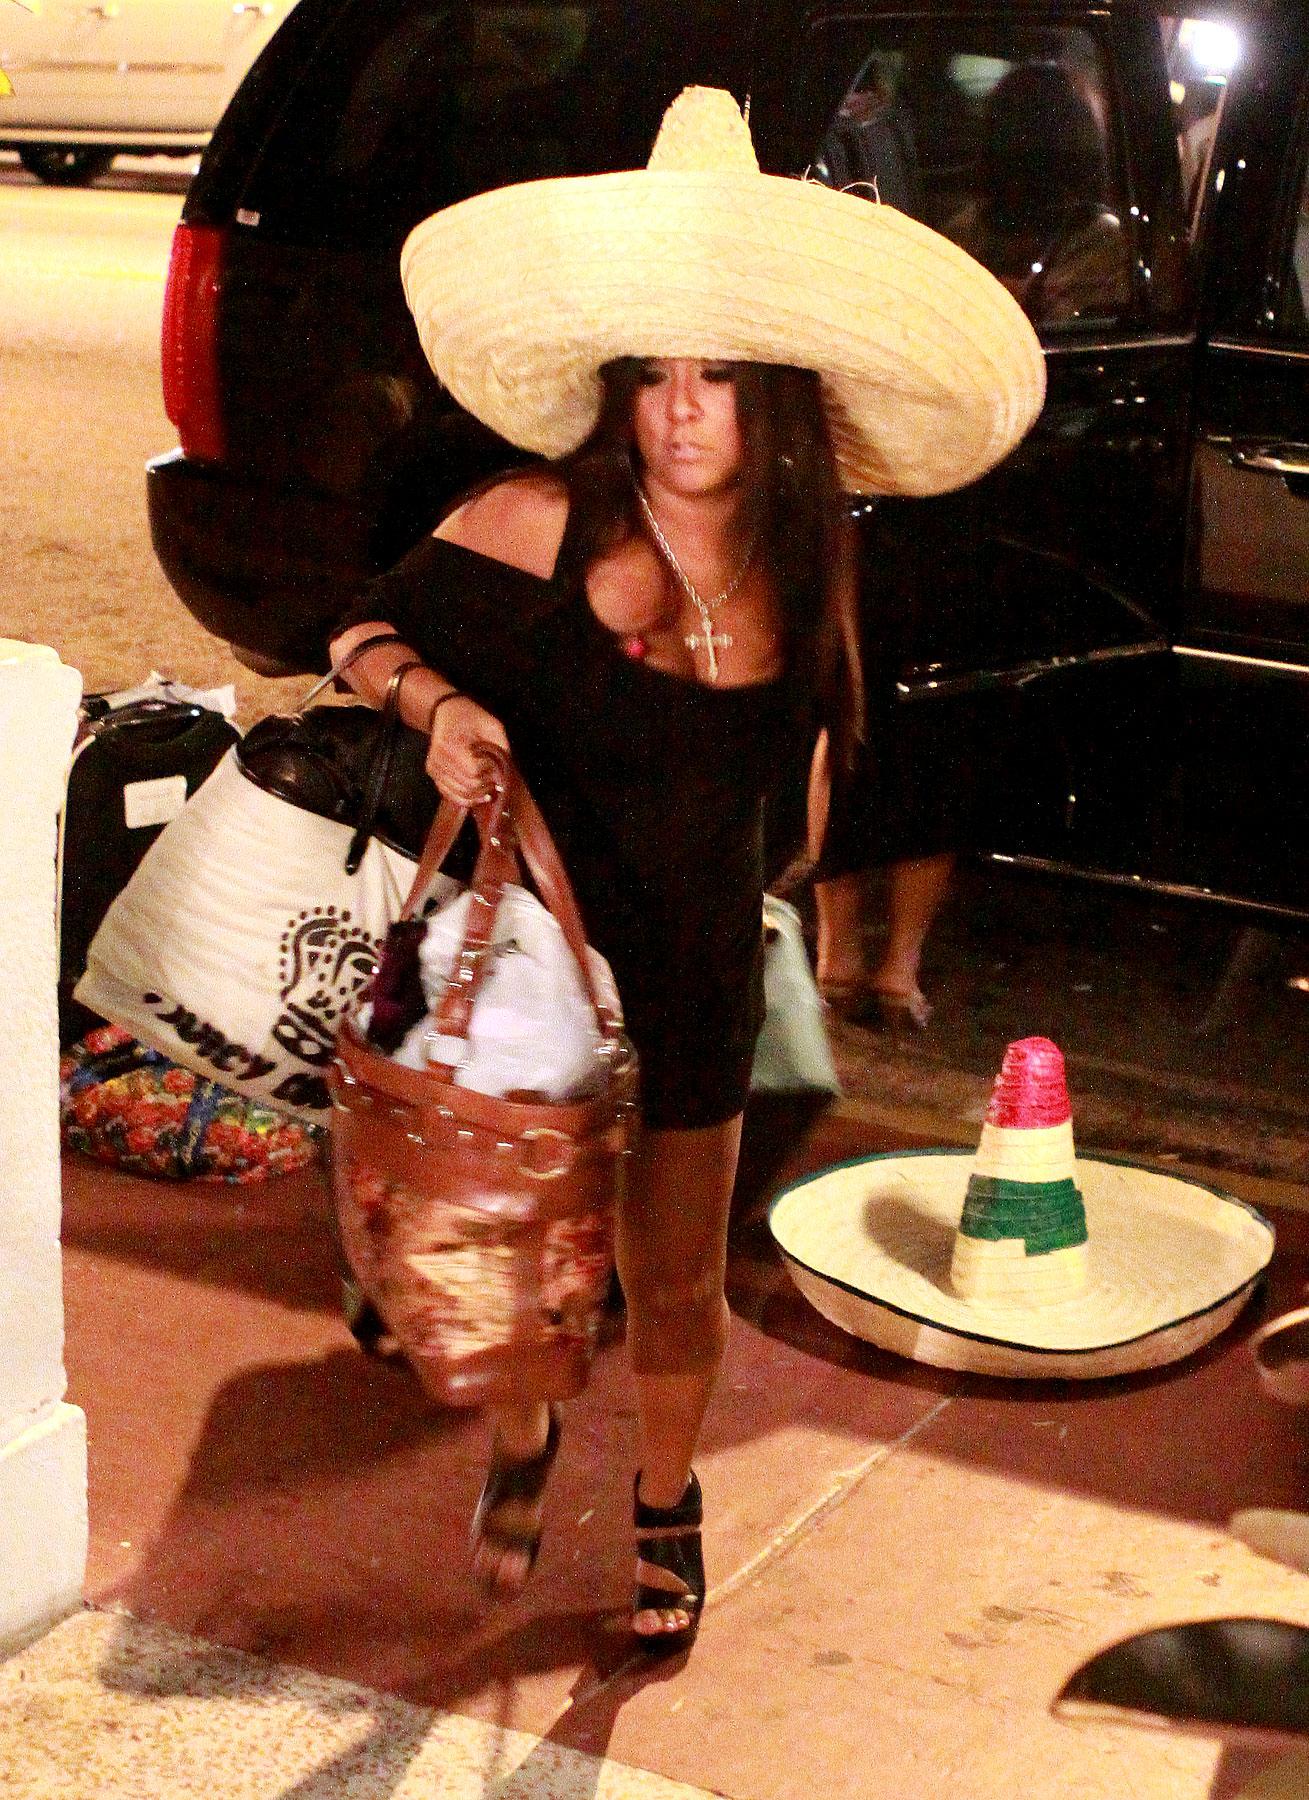 Snooki Gonzales Mistakes Miami for Mexico as 'Jersey Shore' Enters Its Second Season (PHOTOS)